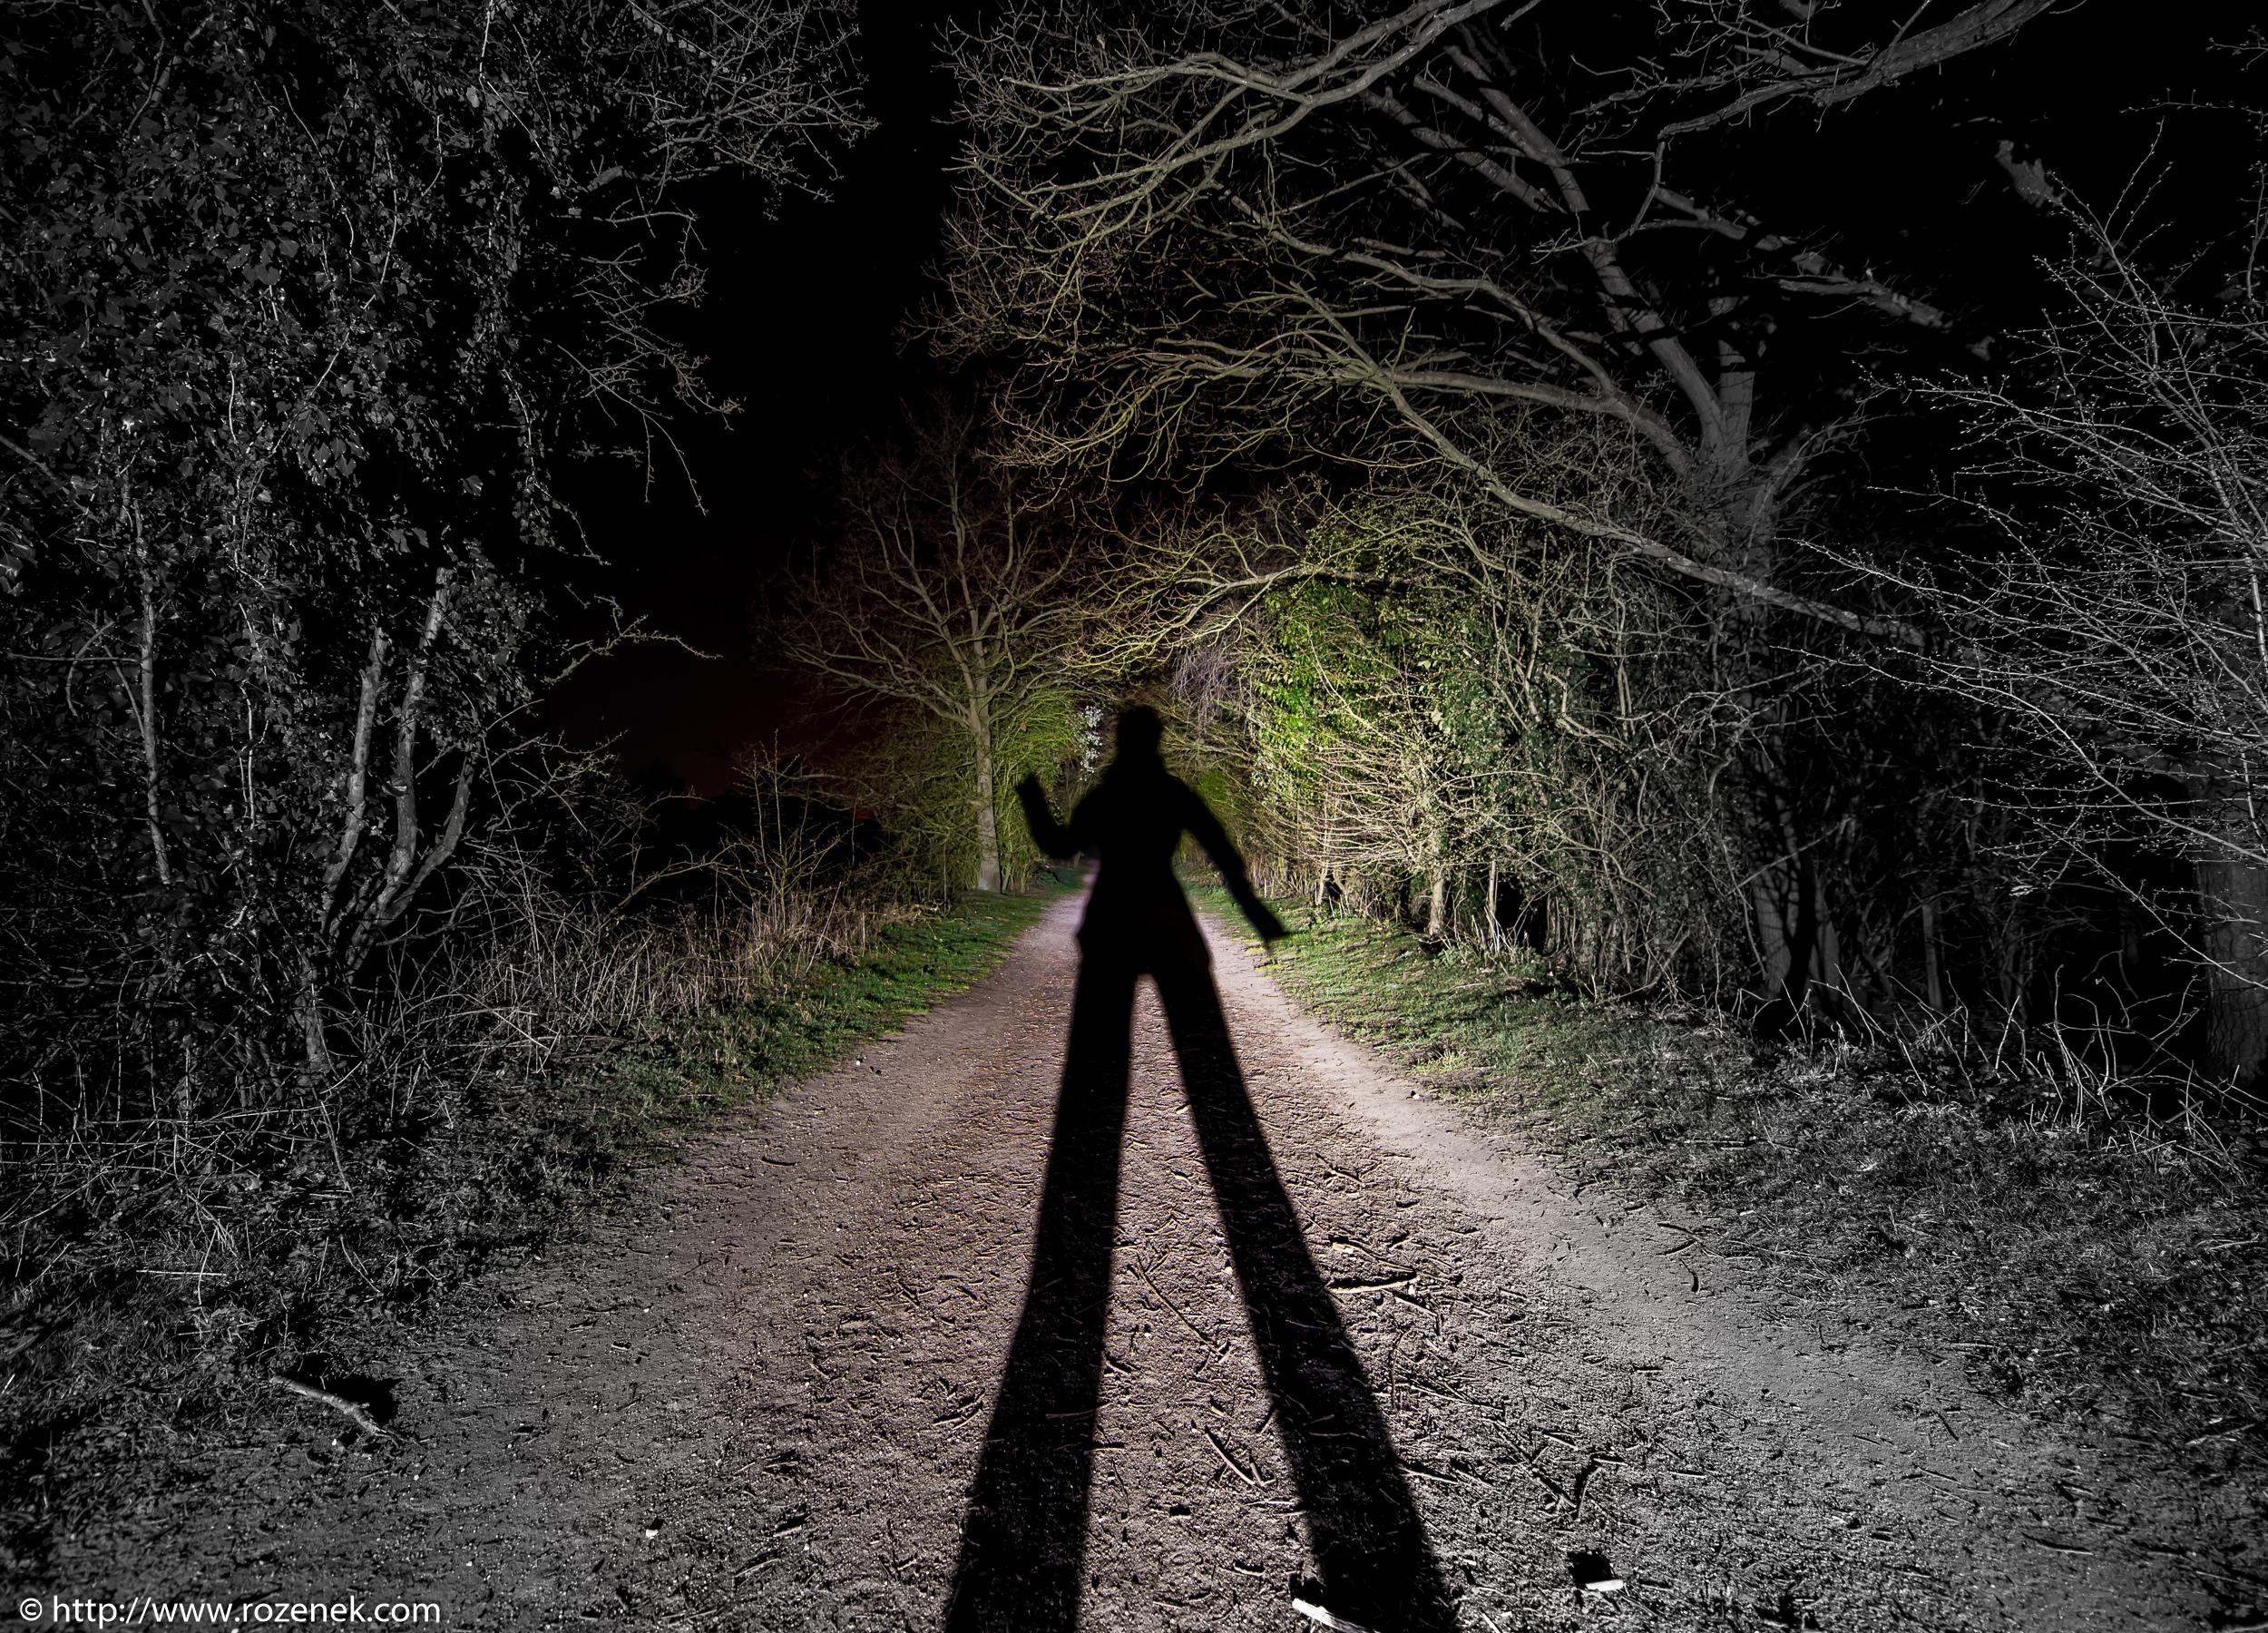 2014.03.25 - Marriotts Way at Night - 01